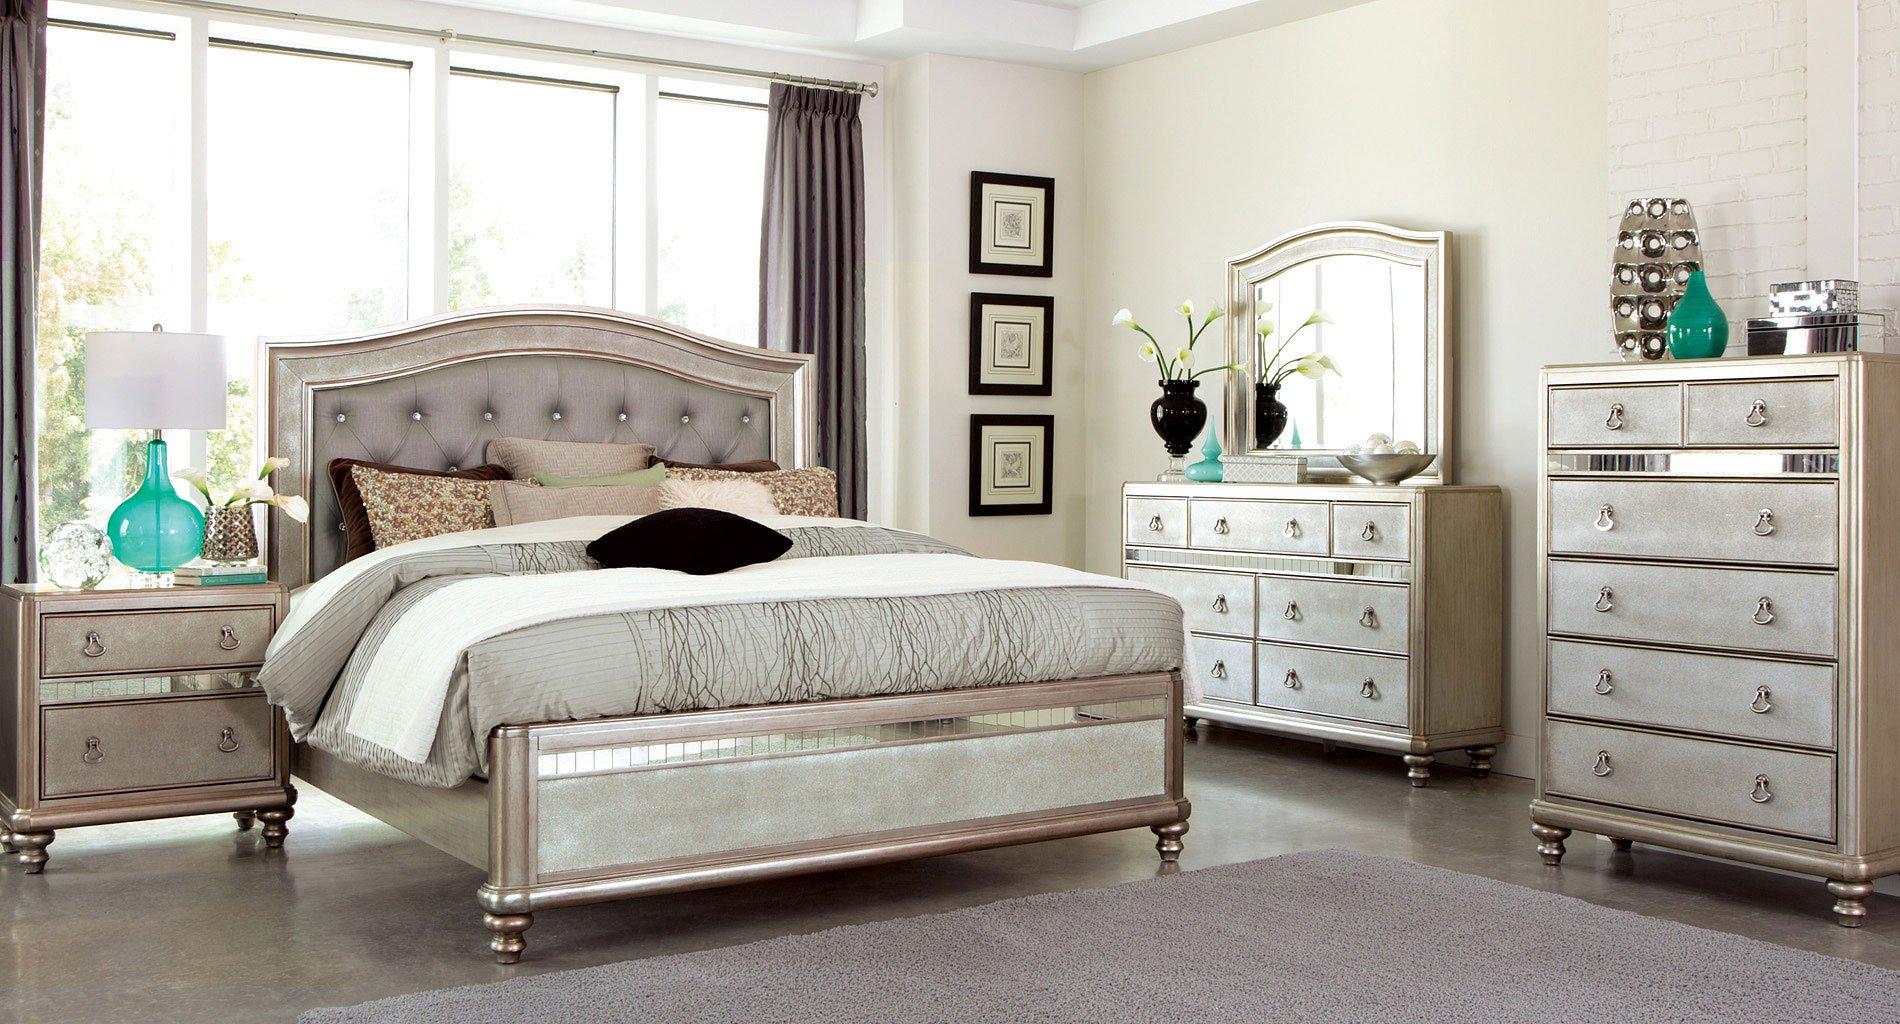 Bling Game Panel Bedroom Set Coaster Furniture 3 Reviews